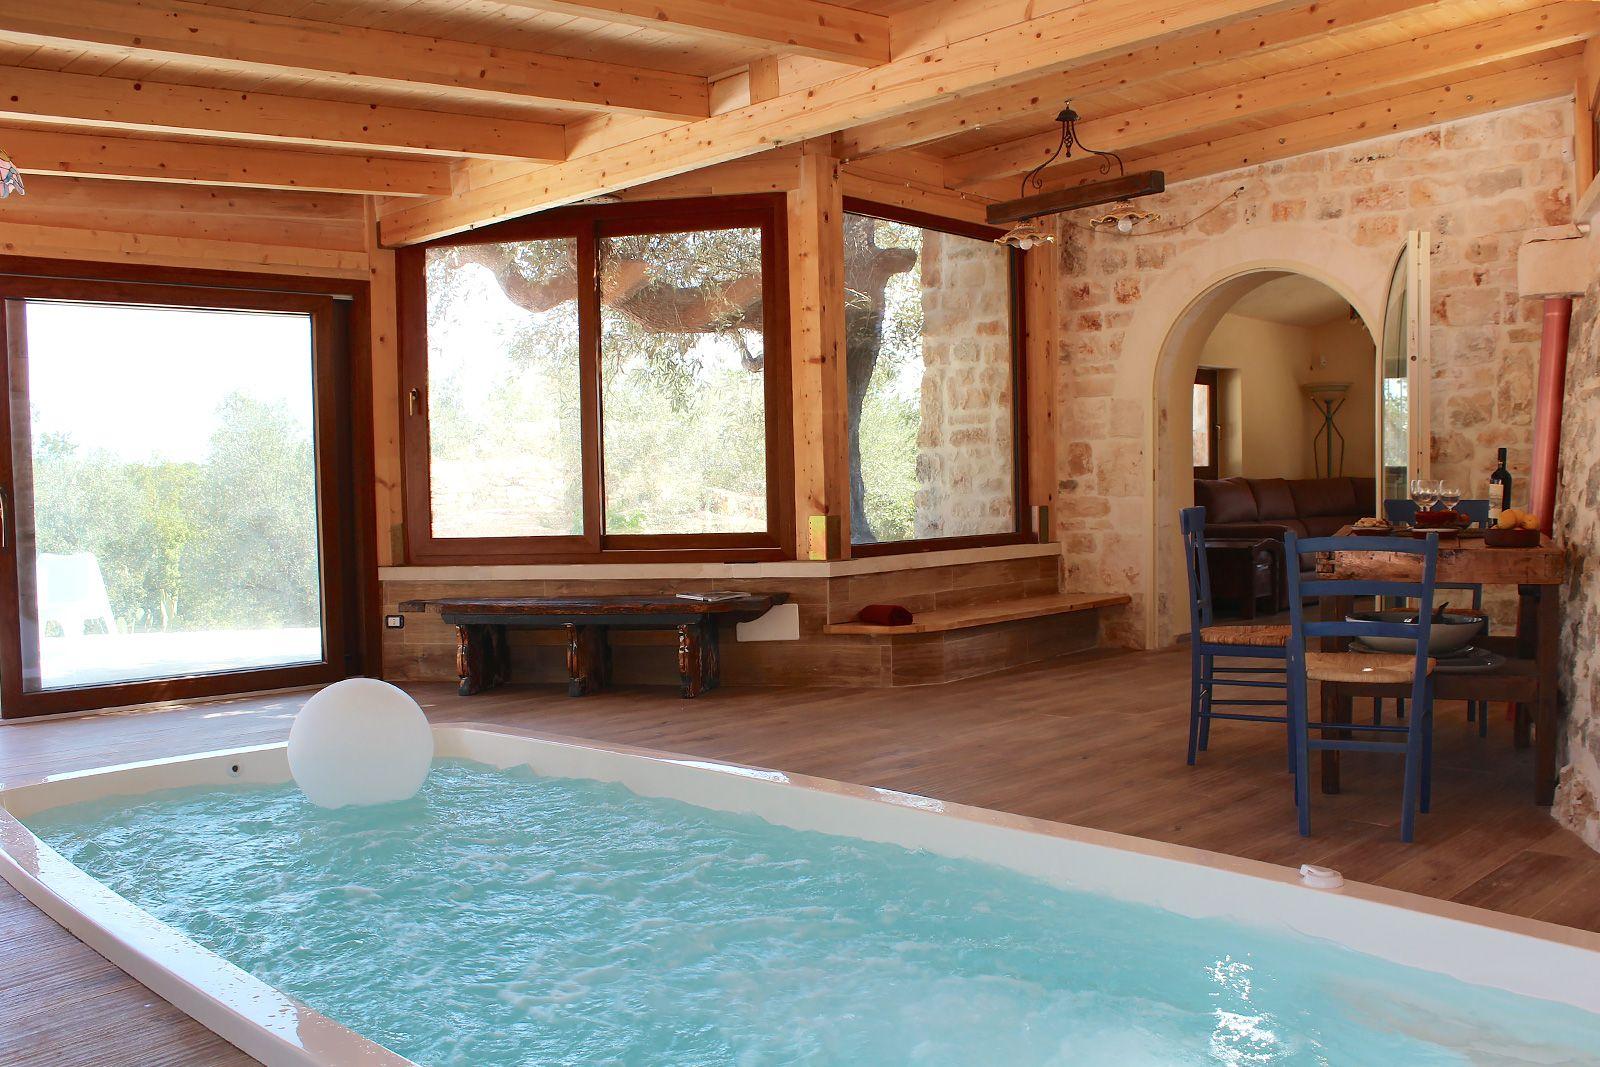 Vacation Home Rentals Vacation home rentals, Italy